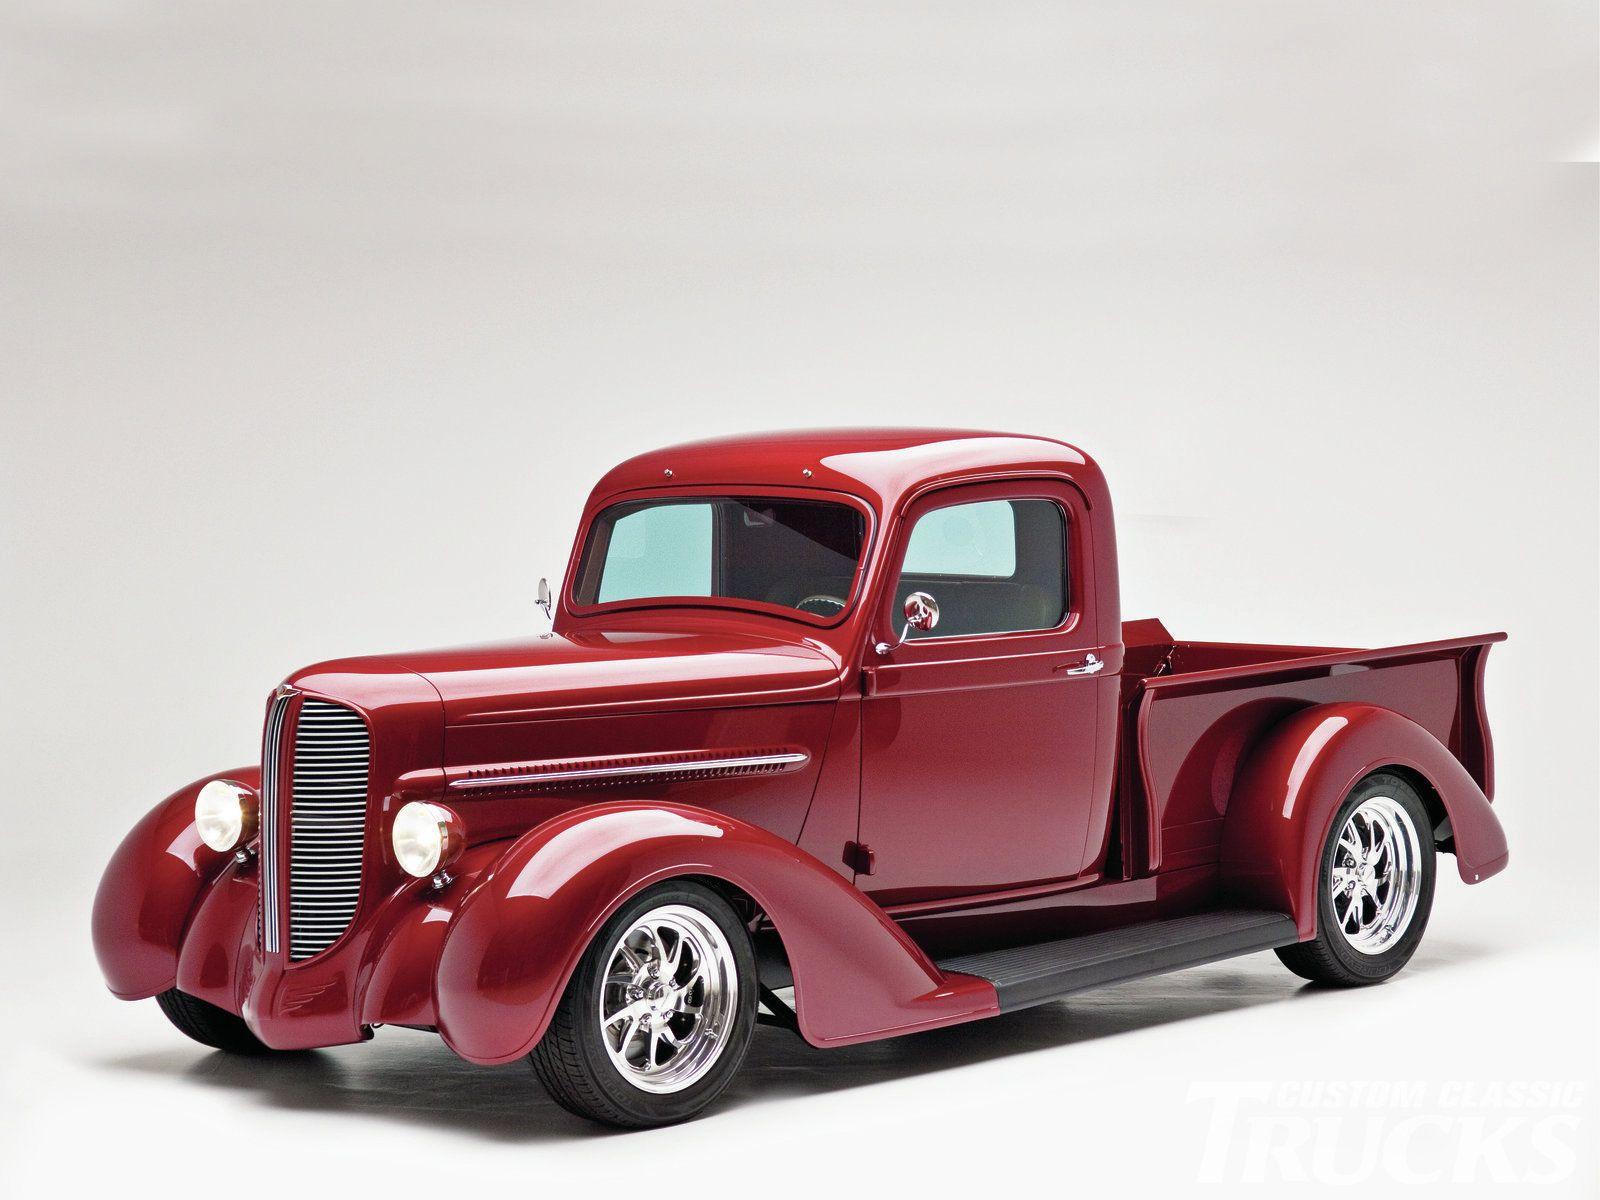 Dodge Truck De 1937 By Cotati Speed Shop De Santa Rosa Condado De Sonoma California Usa Propieda Classic Trucks Classic Trucks Magazine Classic Cars Trucks